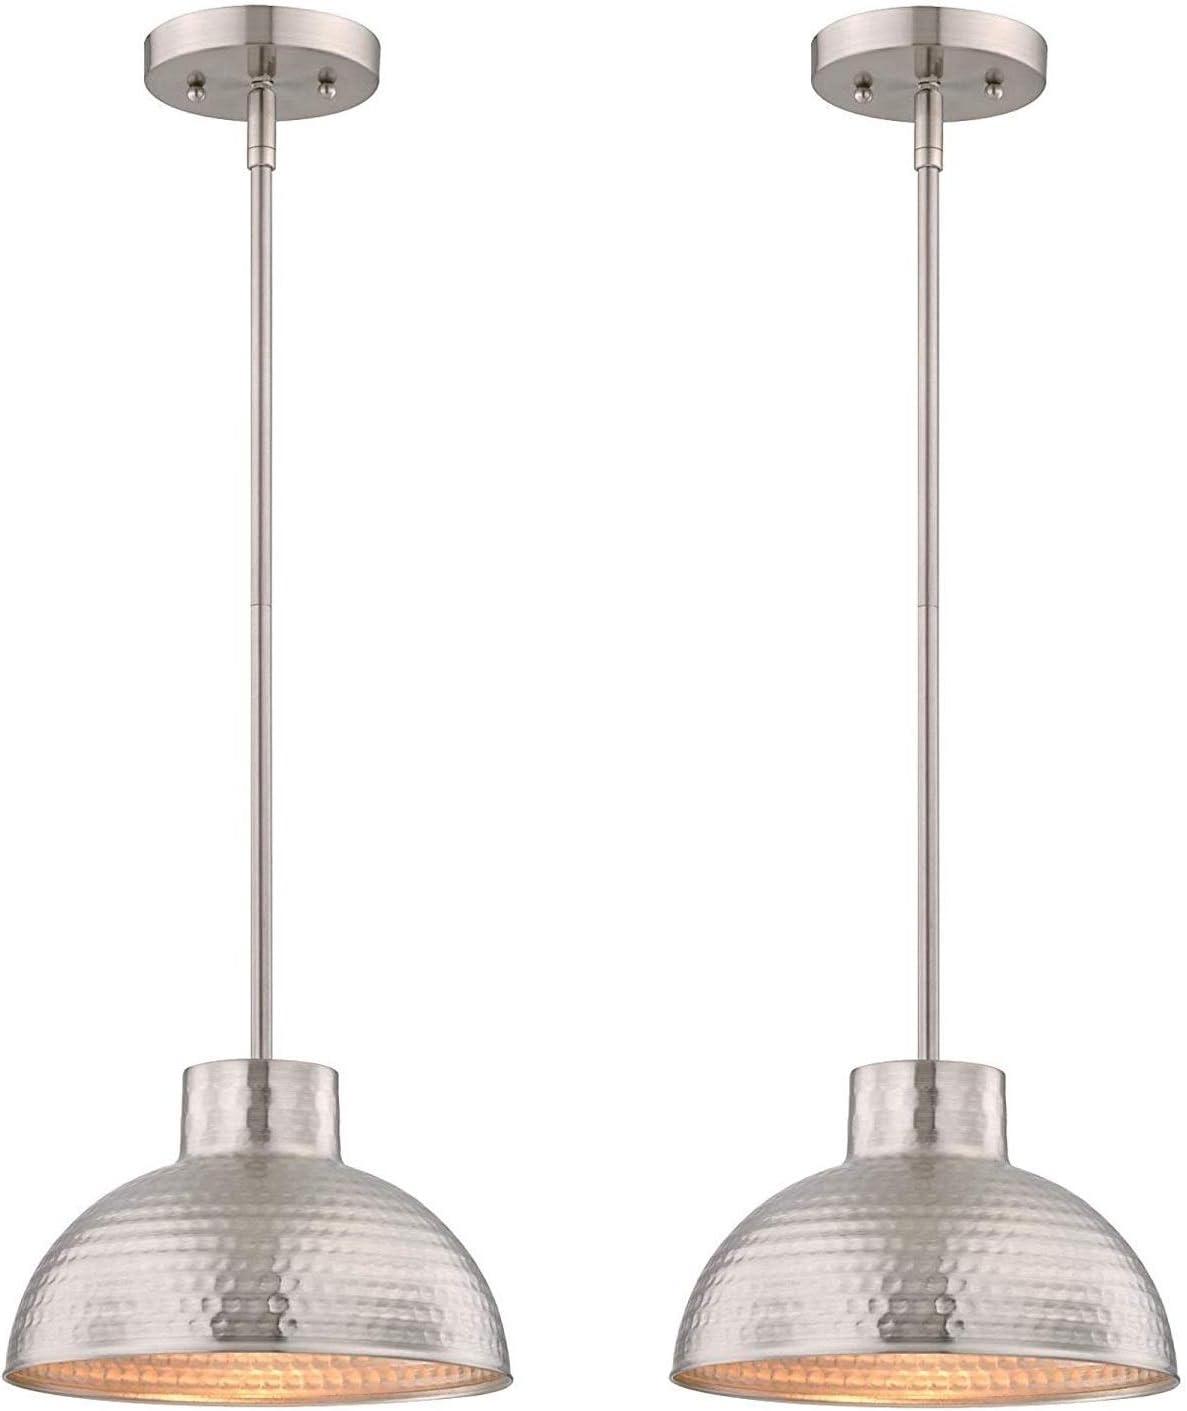 Westinghouse 6345500 One-Light Mini Pendant Industrial Hammered Brushed Nickel Finish